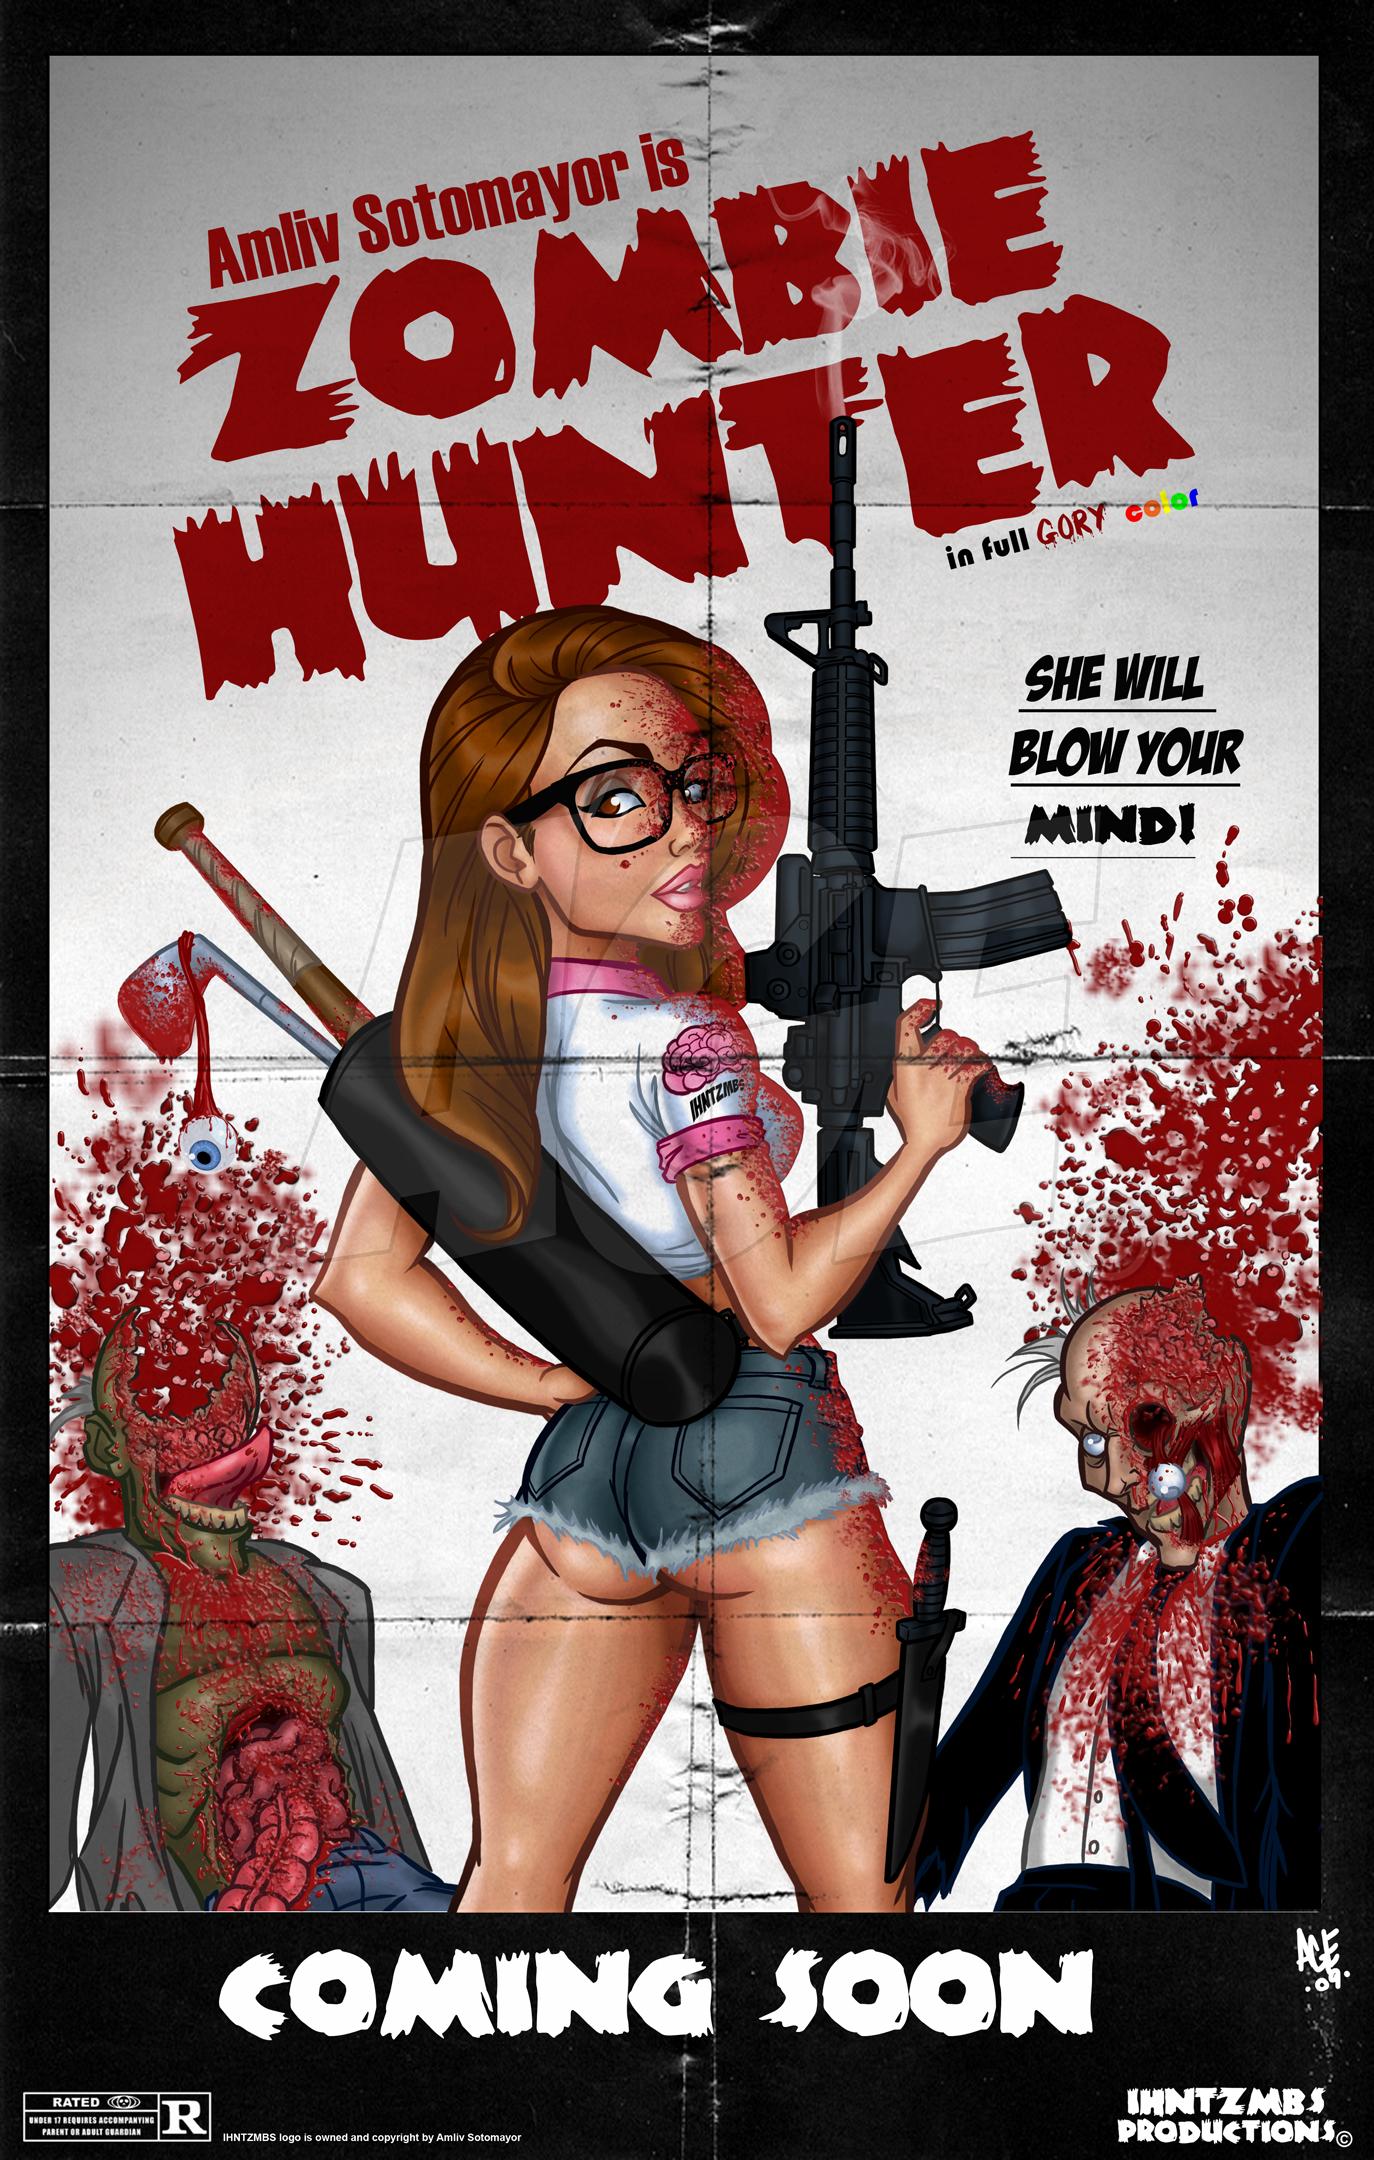 Zombie Hunter poster by Age-Velez